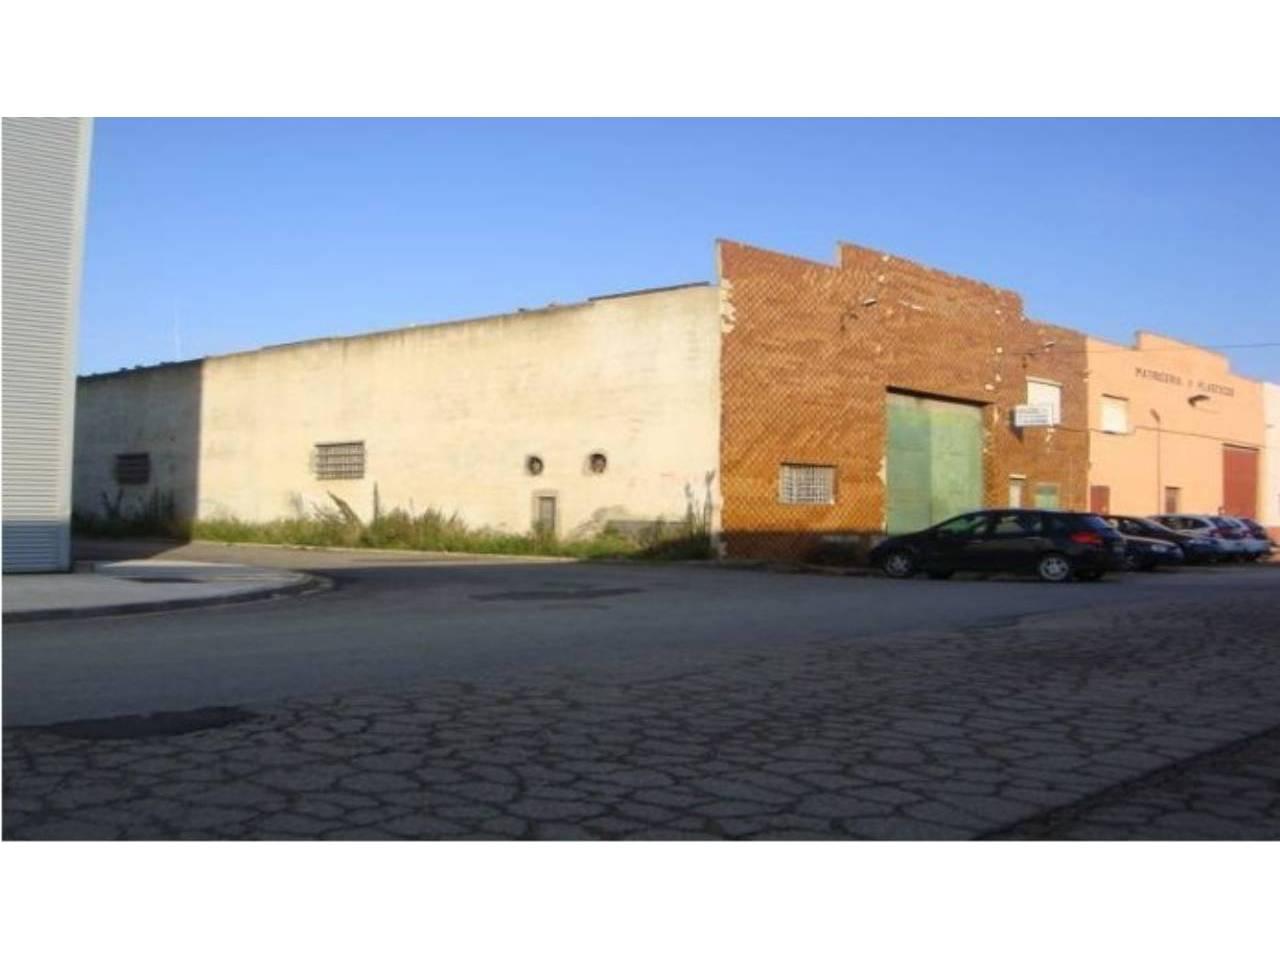 Nave industrial  Albal. Superf. 862 m², 862 m² solar,  2 , trastero, garaje, estado cert